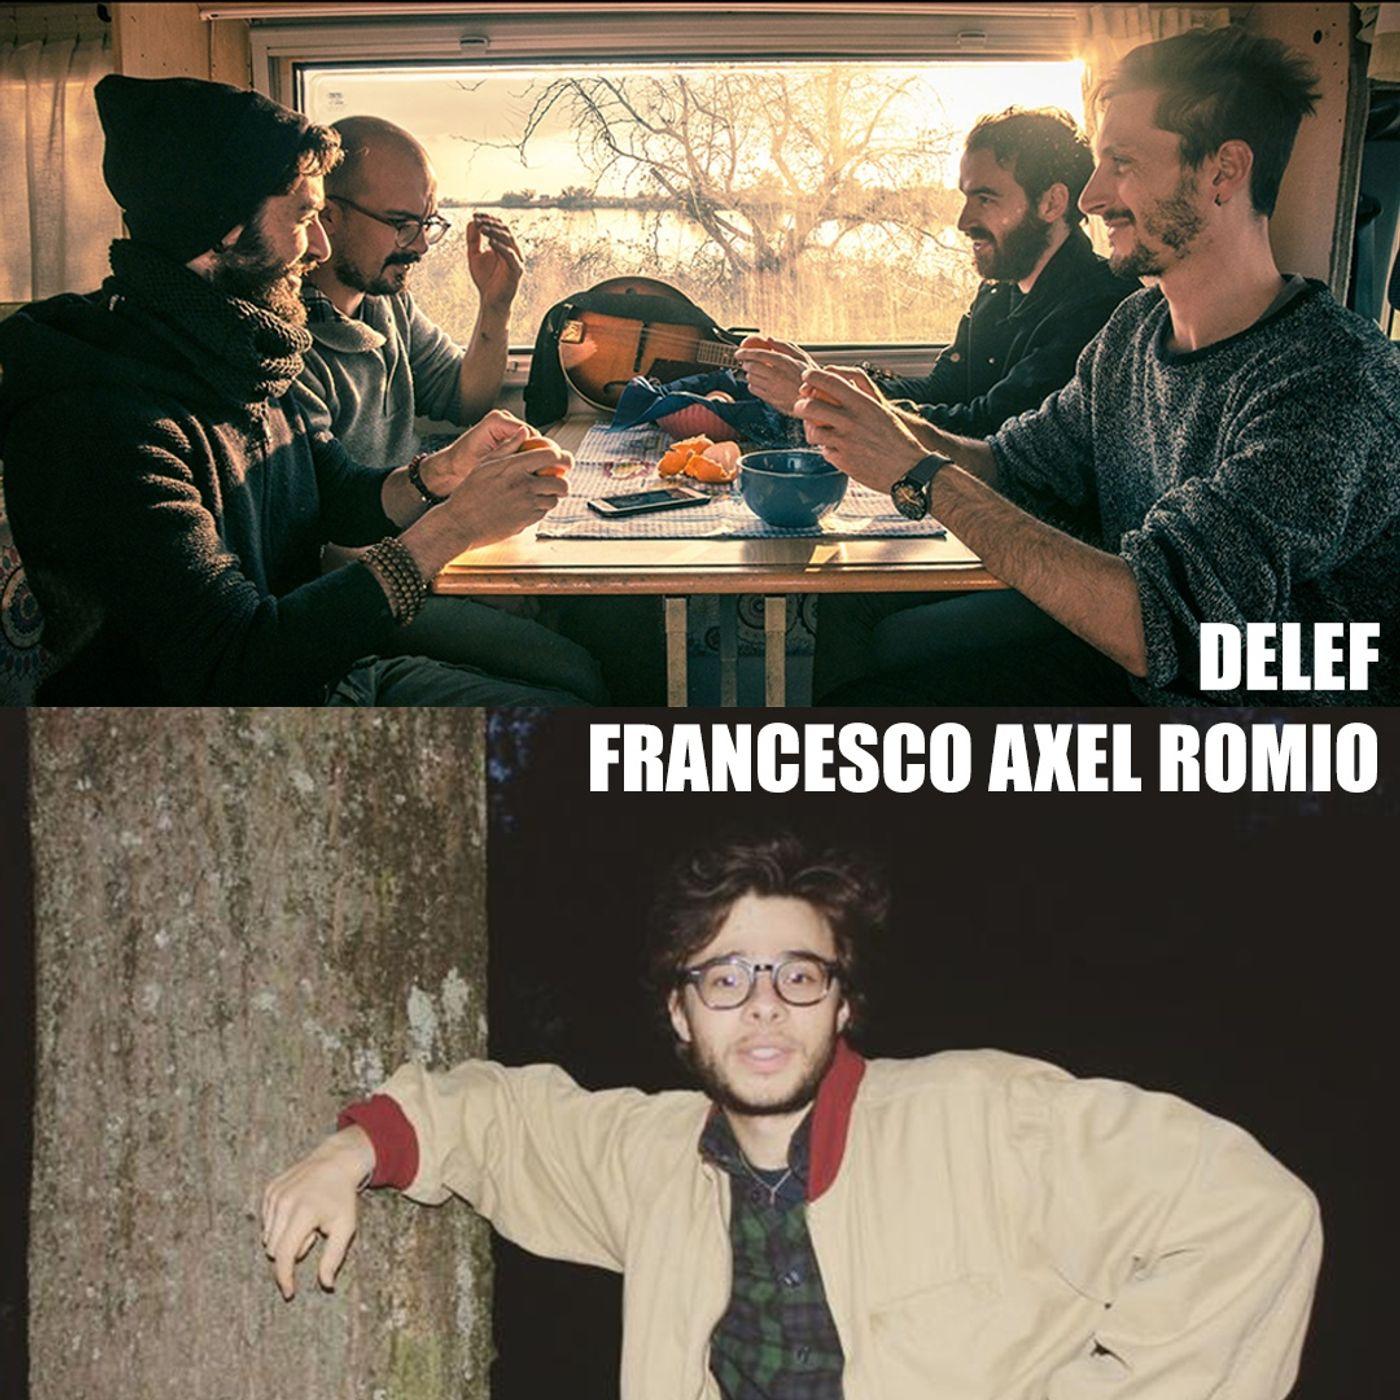 Delef & Francesco Axel Romio: musicisti con singoli ed EP freschi d'uscita - Karmadillo - s03e22